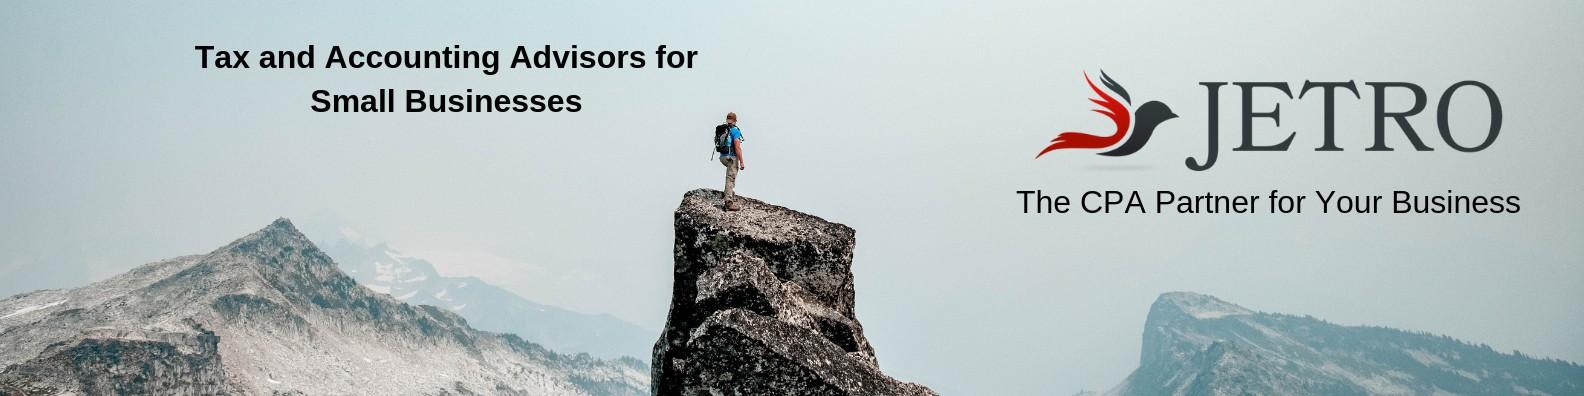 JETRO and Associates | LinkedIn